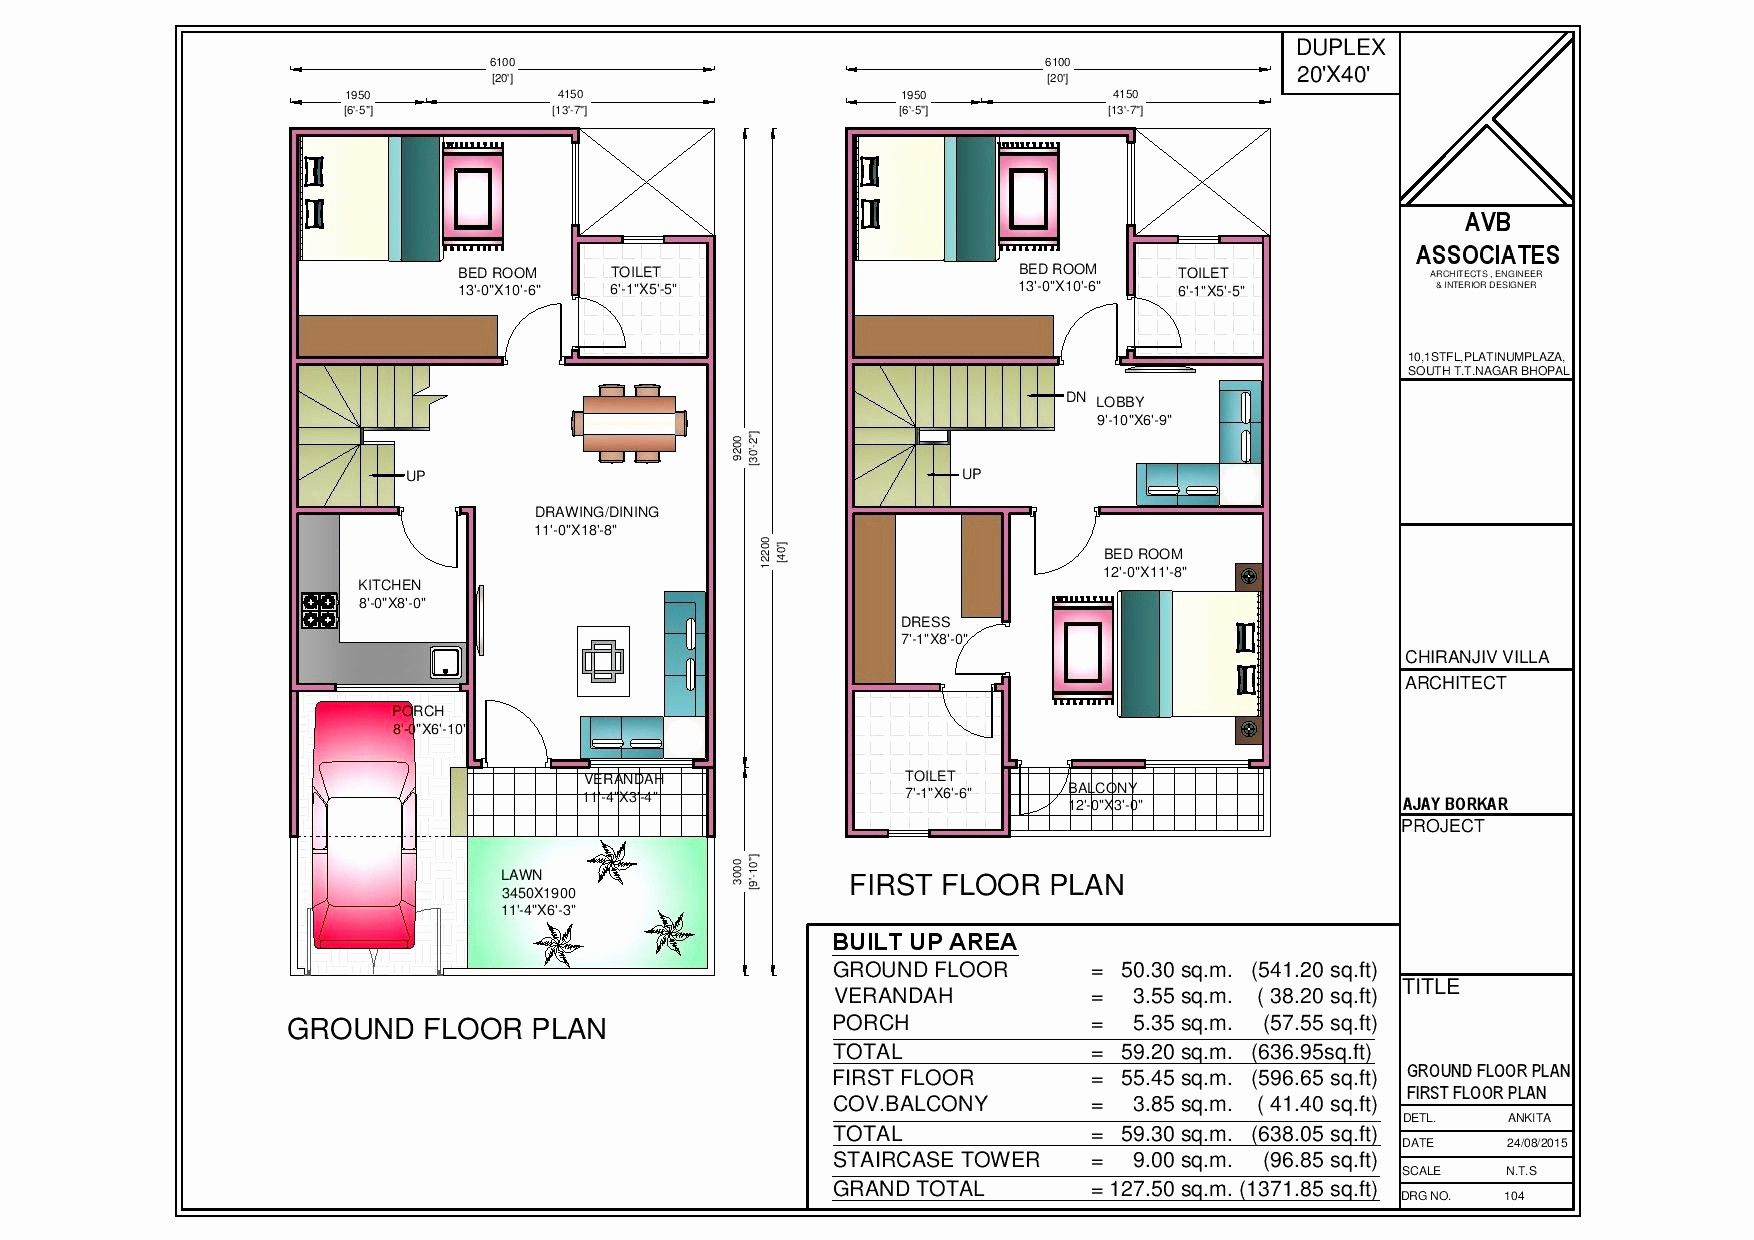 1200 Sq Ft House Plans Inspirational 600 Sq Ft Duplex House Plans 500 Square Feet House Plans 600 Sq Ft 20x40 House Plans 2bhk House Plan 30x40 House Plans